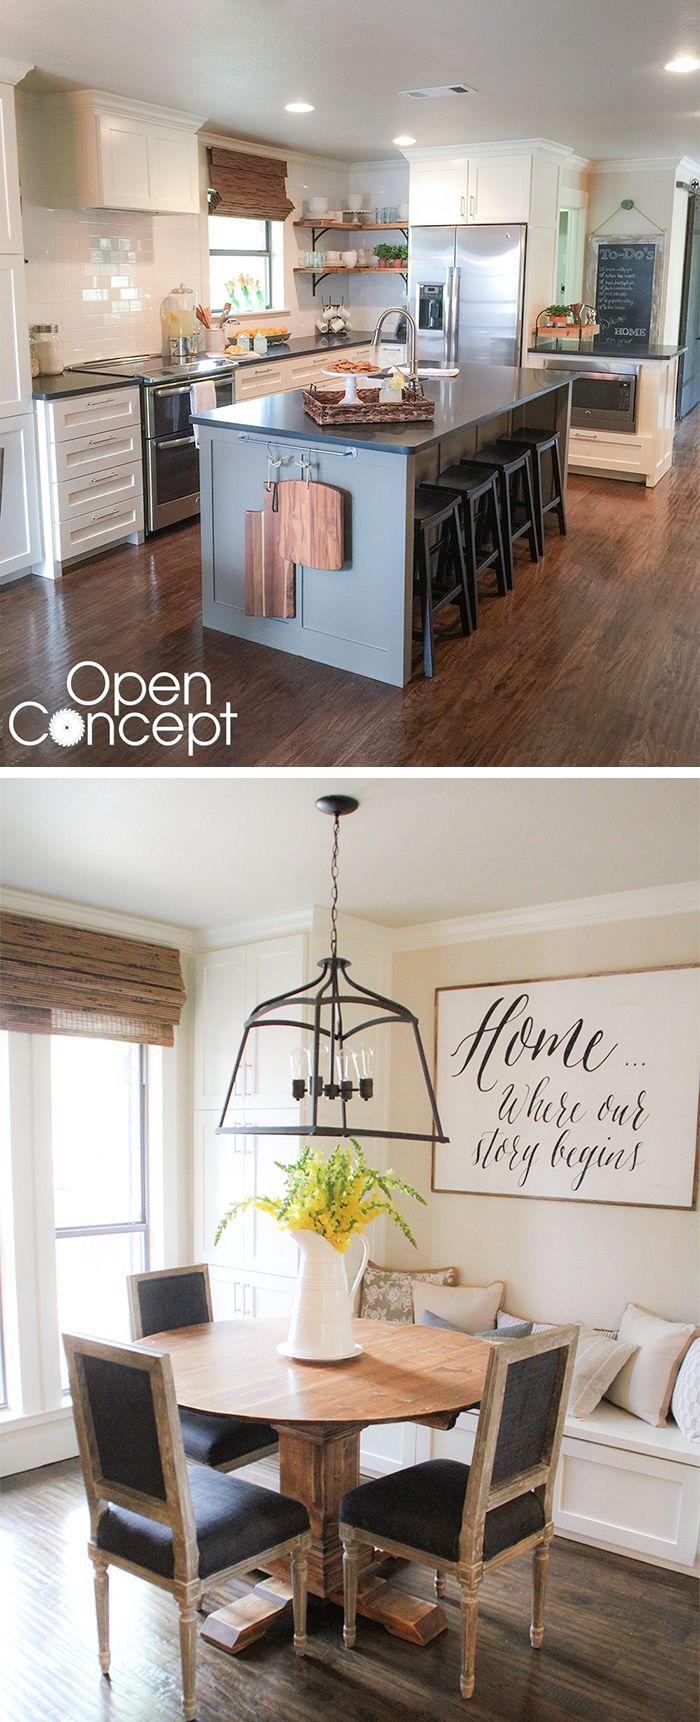 Open Concept Kitchen Layout Open Concept Kitchen Kitchen Remodel